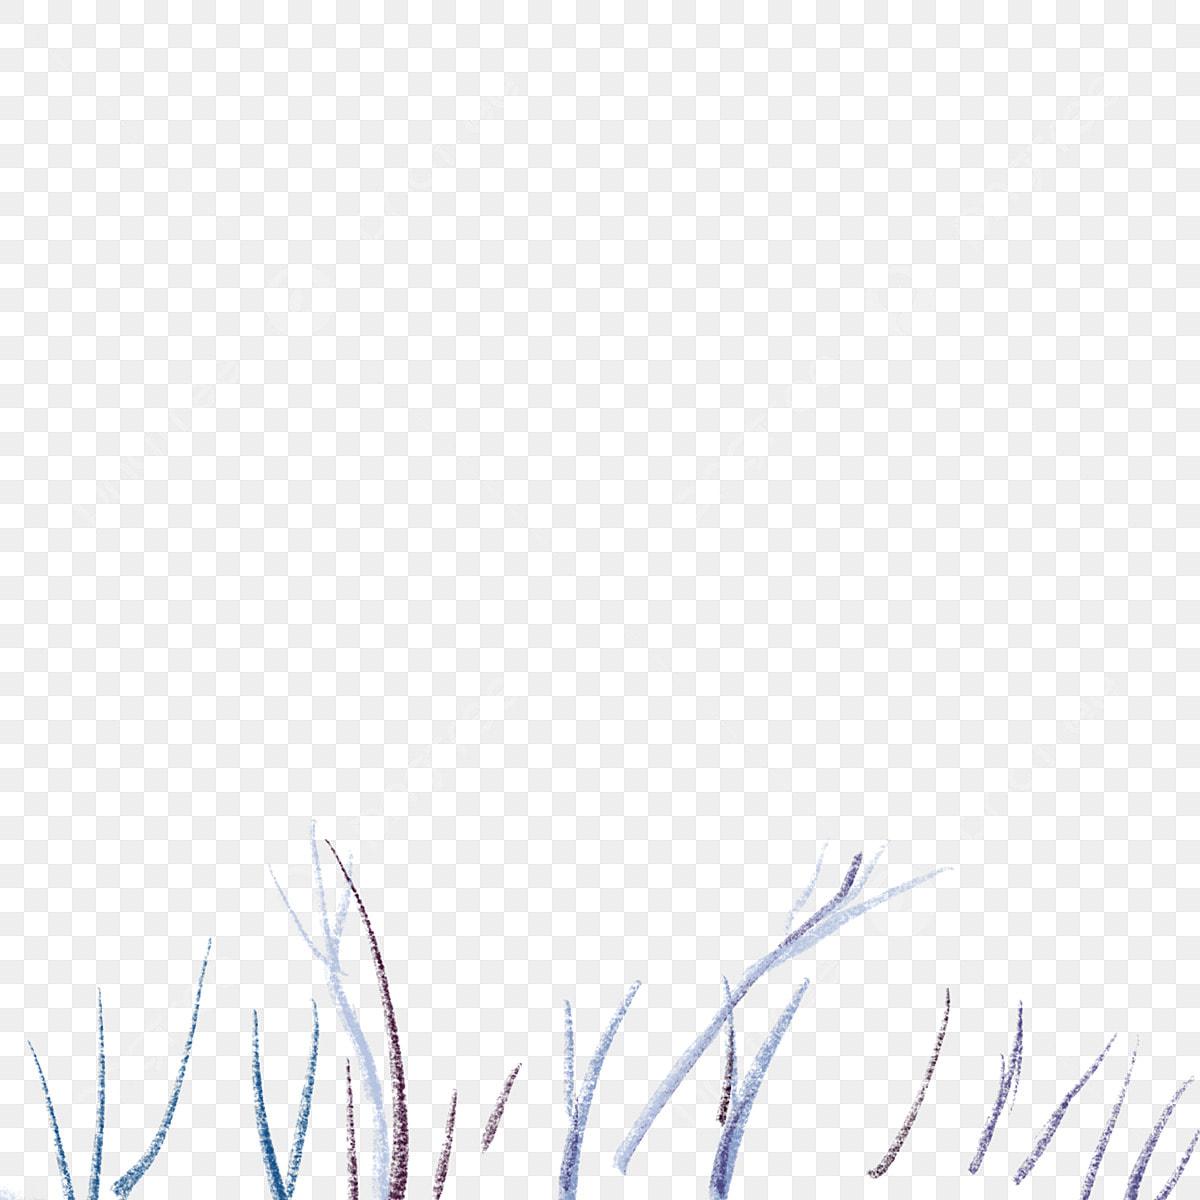 Kilang Musim Sejuk Kilang Kartun Tumbuhan Fros Tergantung